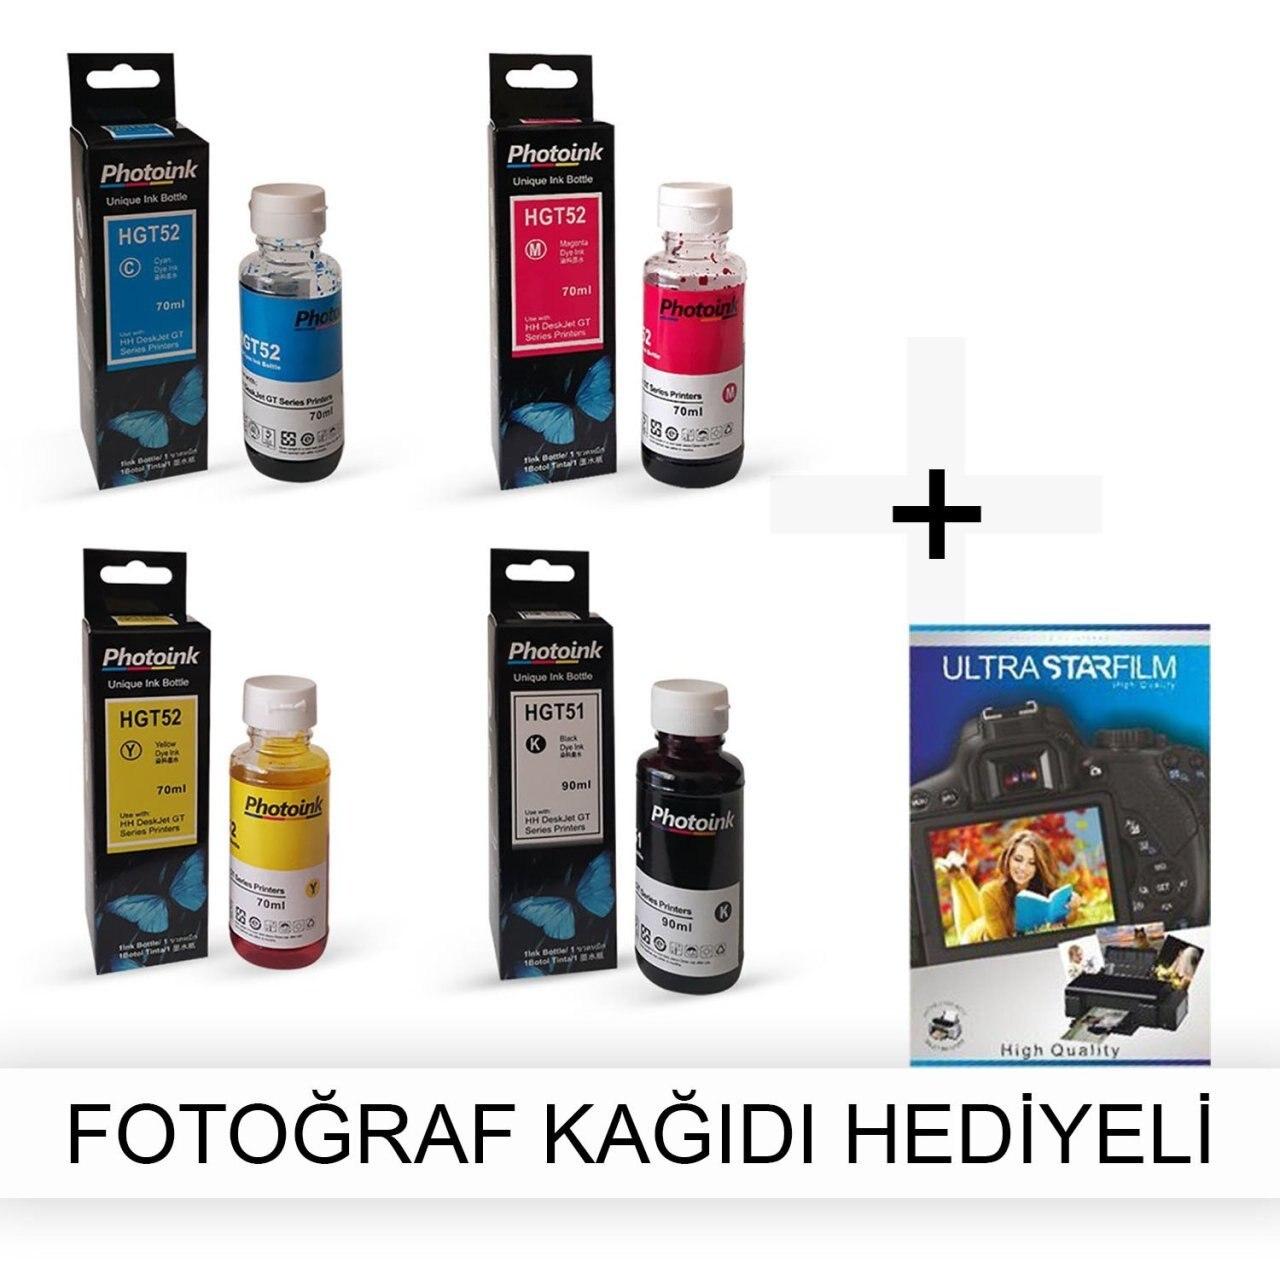 HP Deskjet 959c 1 Suit Photoink Ink Photo Paper Gift Photo Paper     - title=